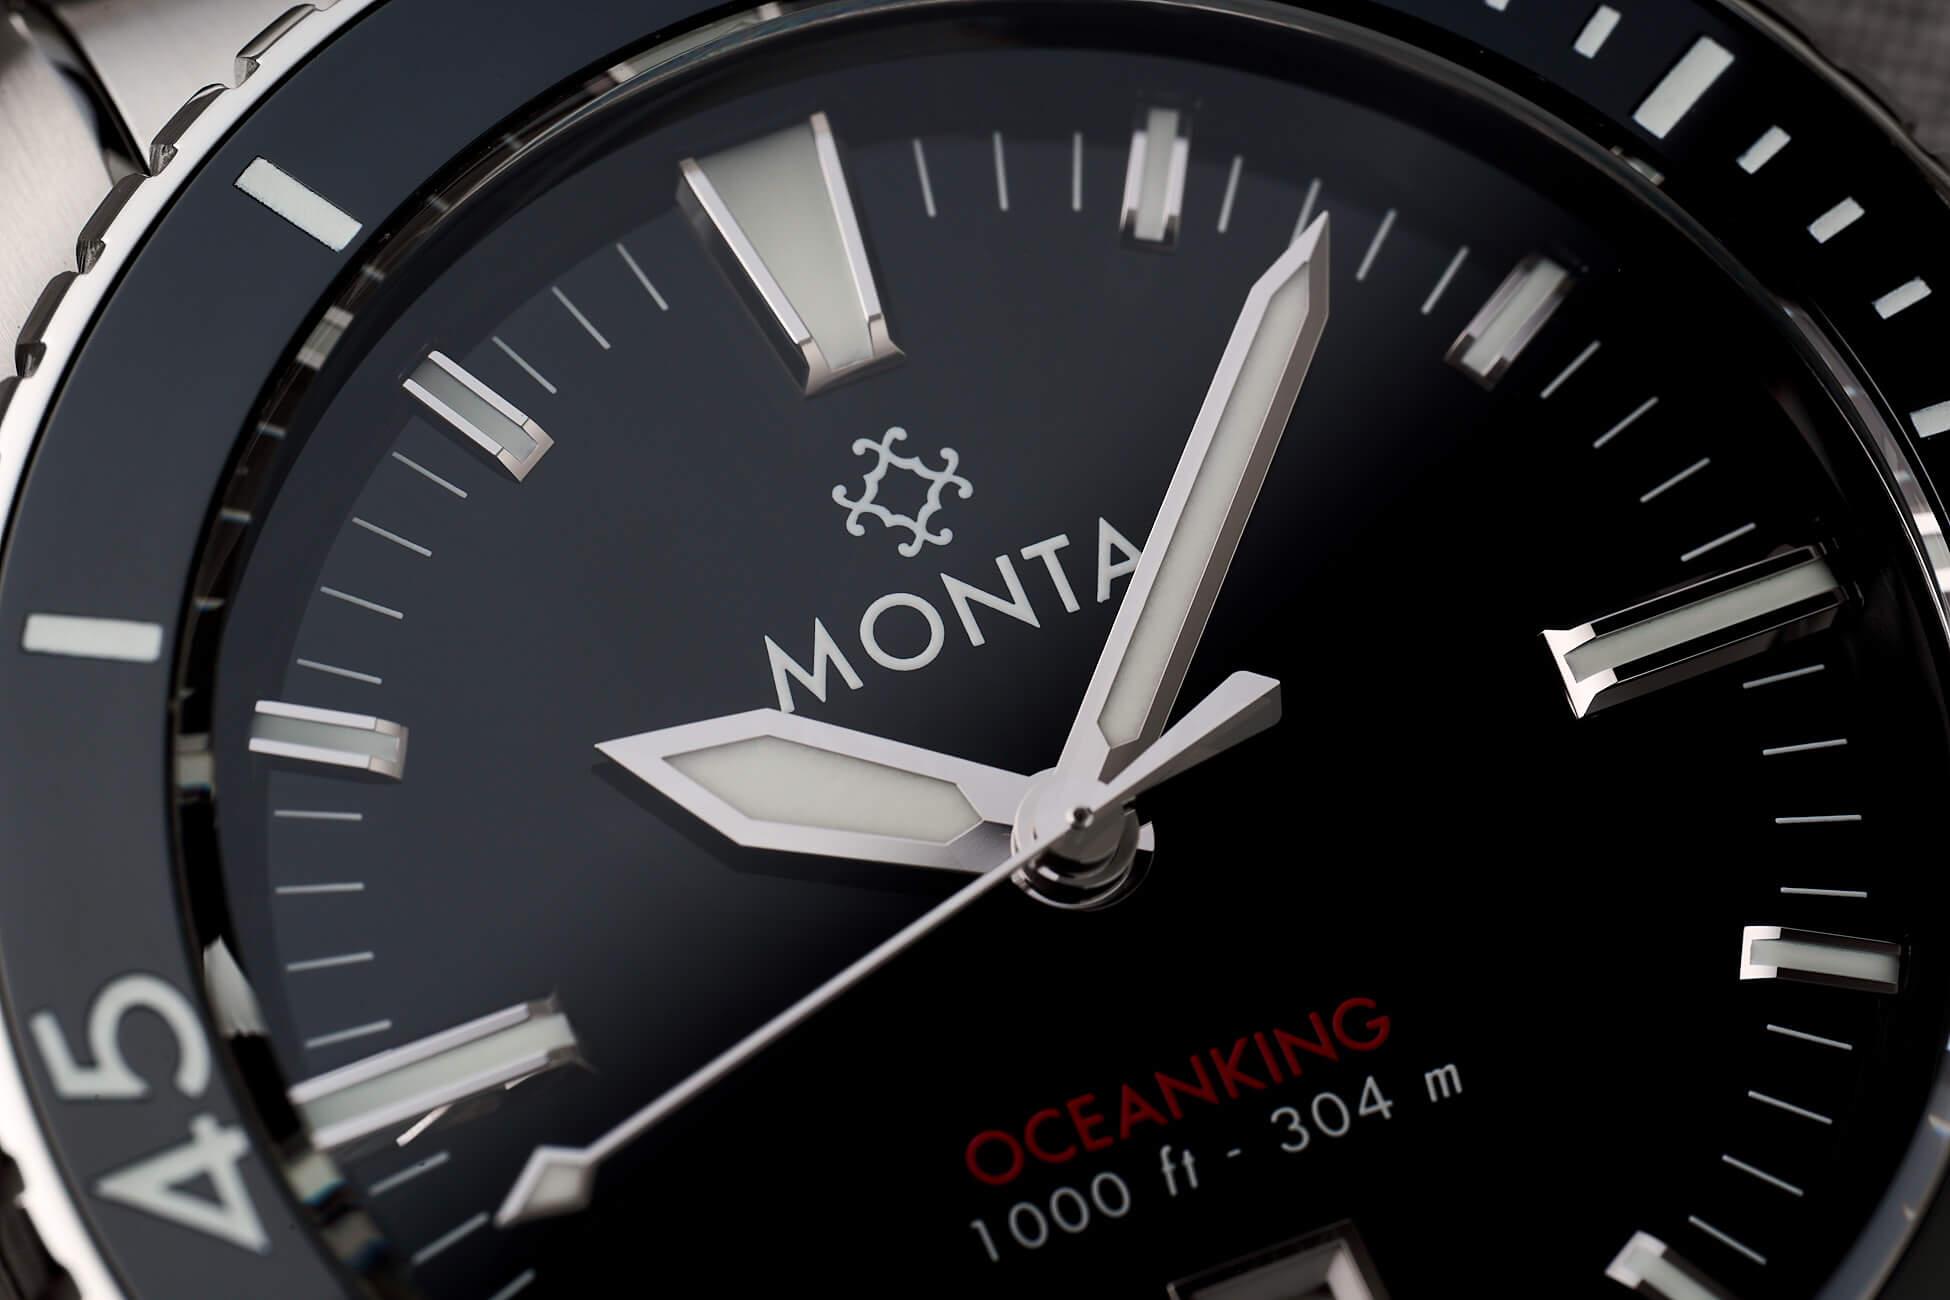 monta-oceanking-2